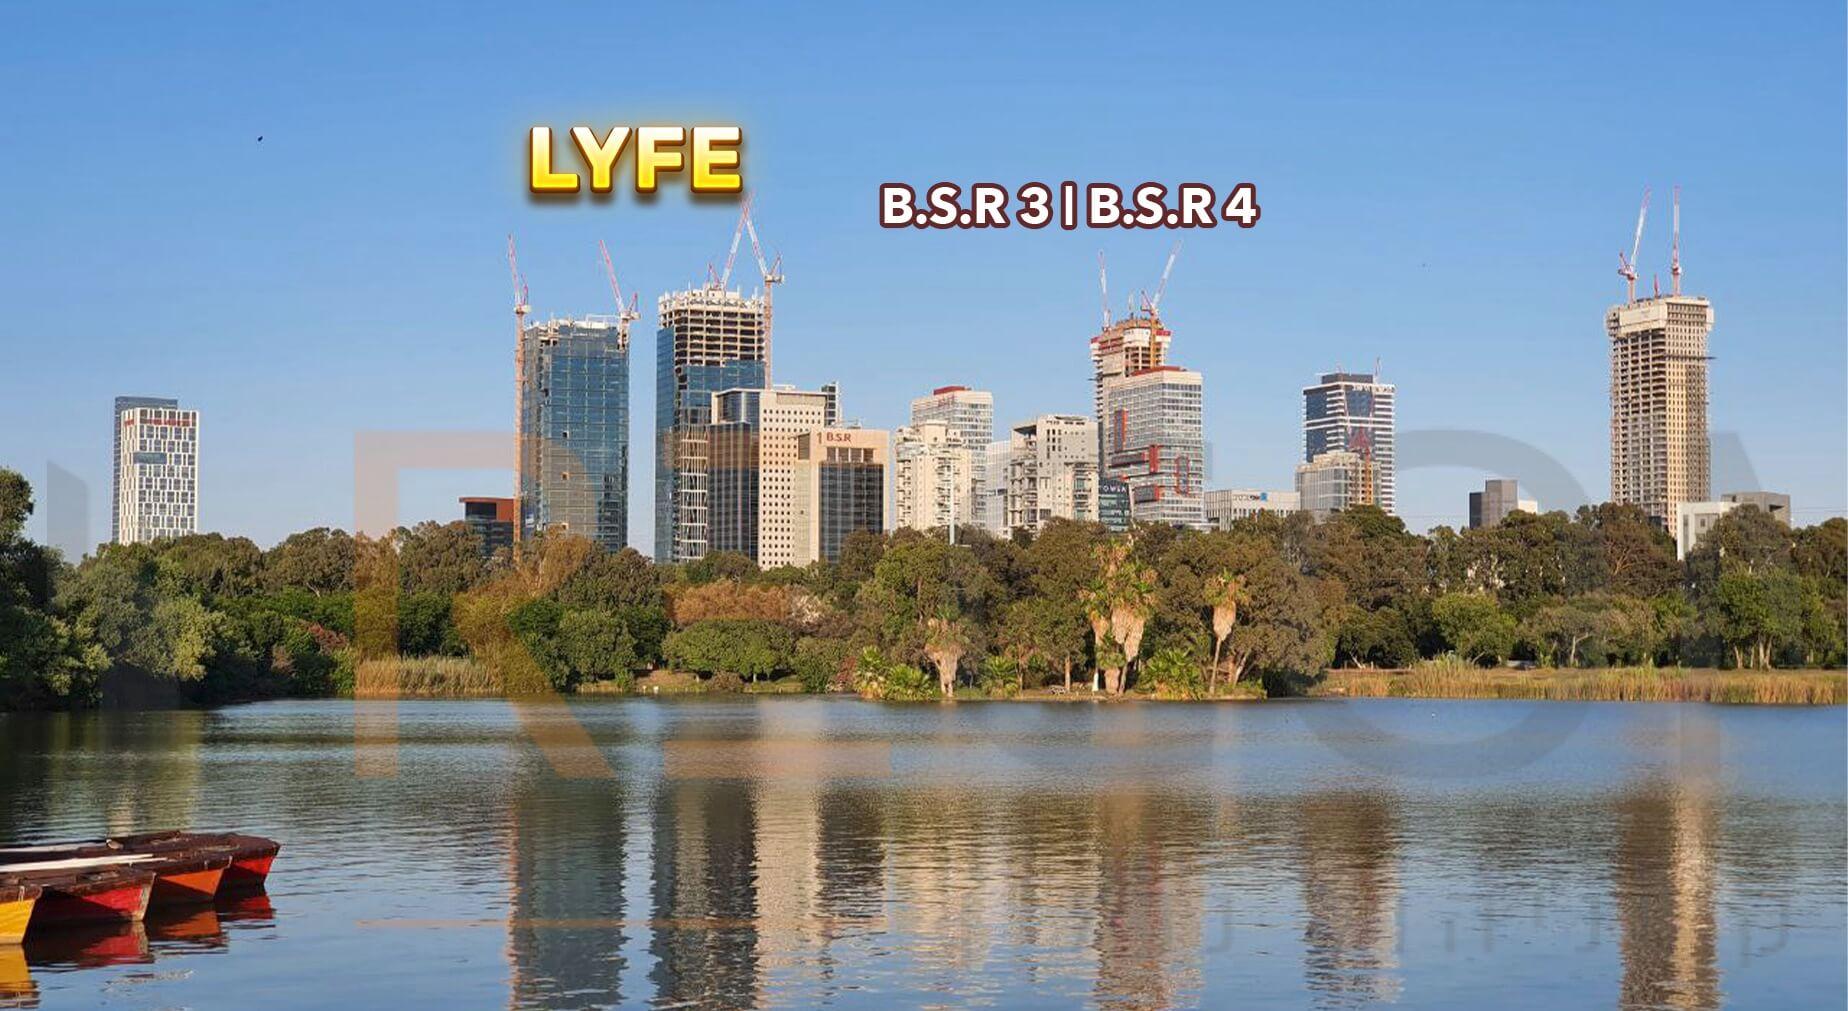 https://lyfetowers.co.il/wp-content/uploads/2021/07/LYFE_2021_11.jpg